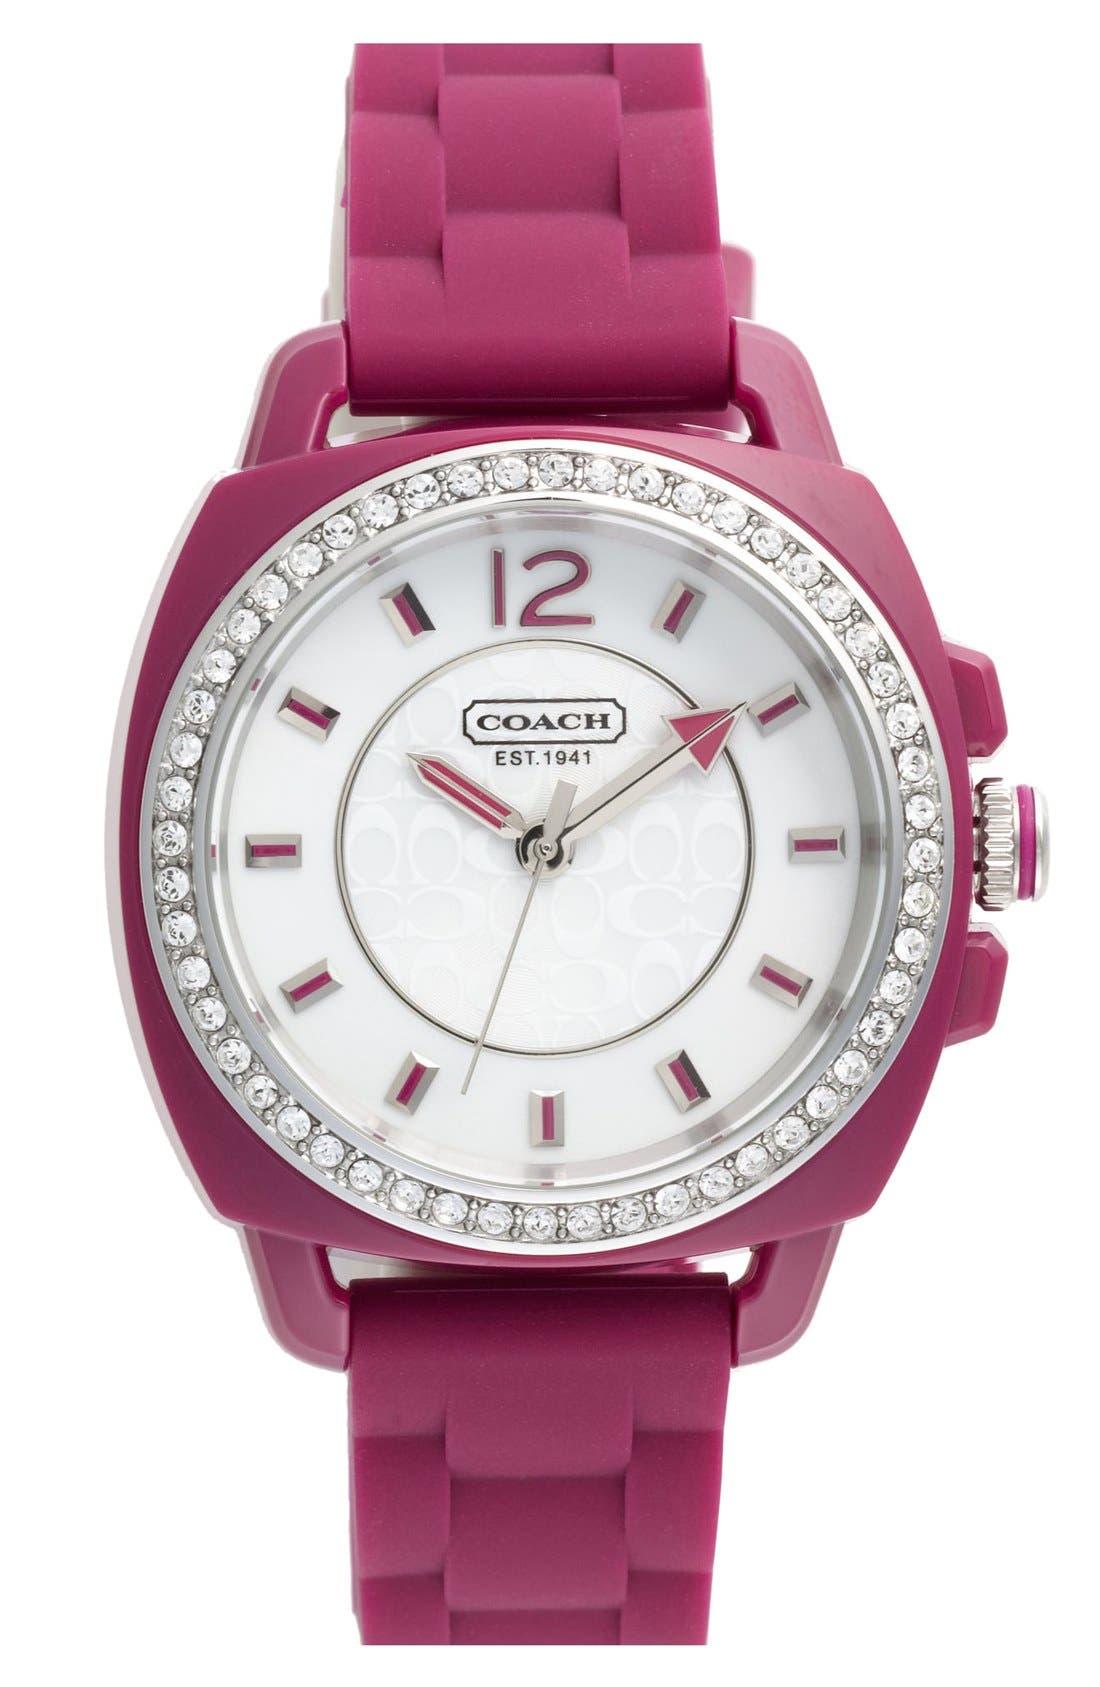 Main Image - COACH 'Boyfriend' Crystal Bezel Watch, 39mm